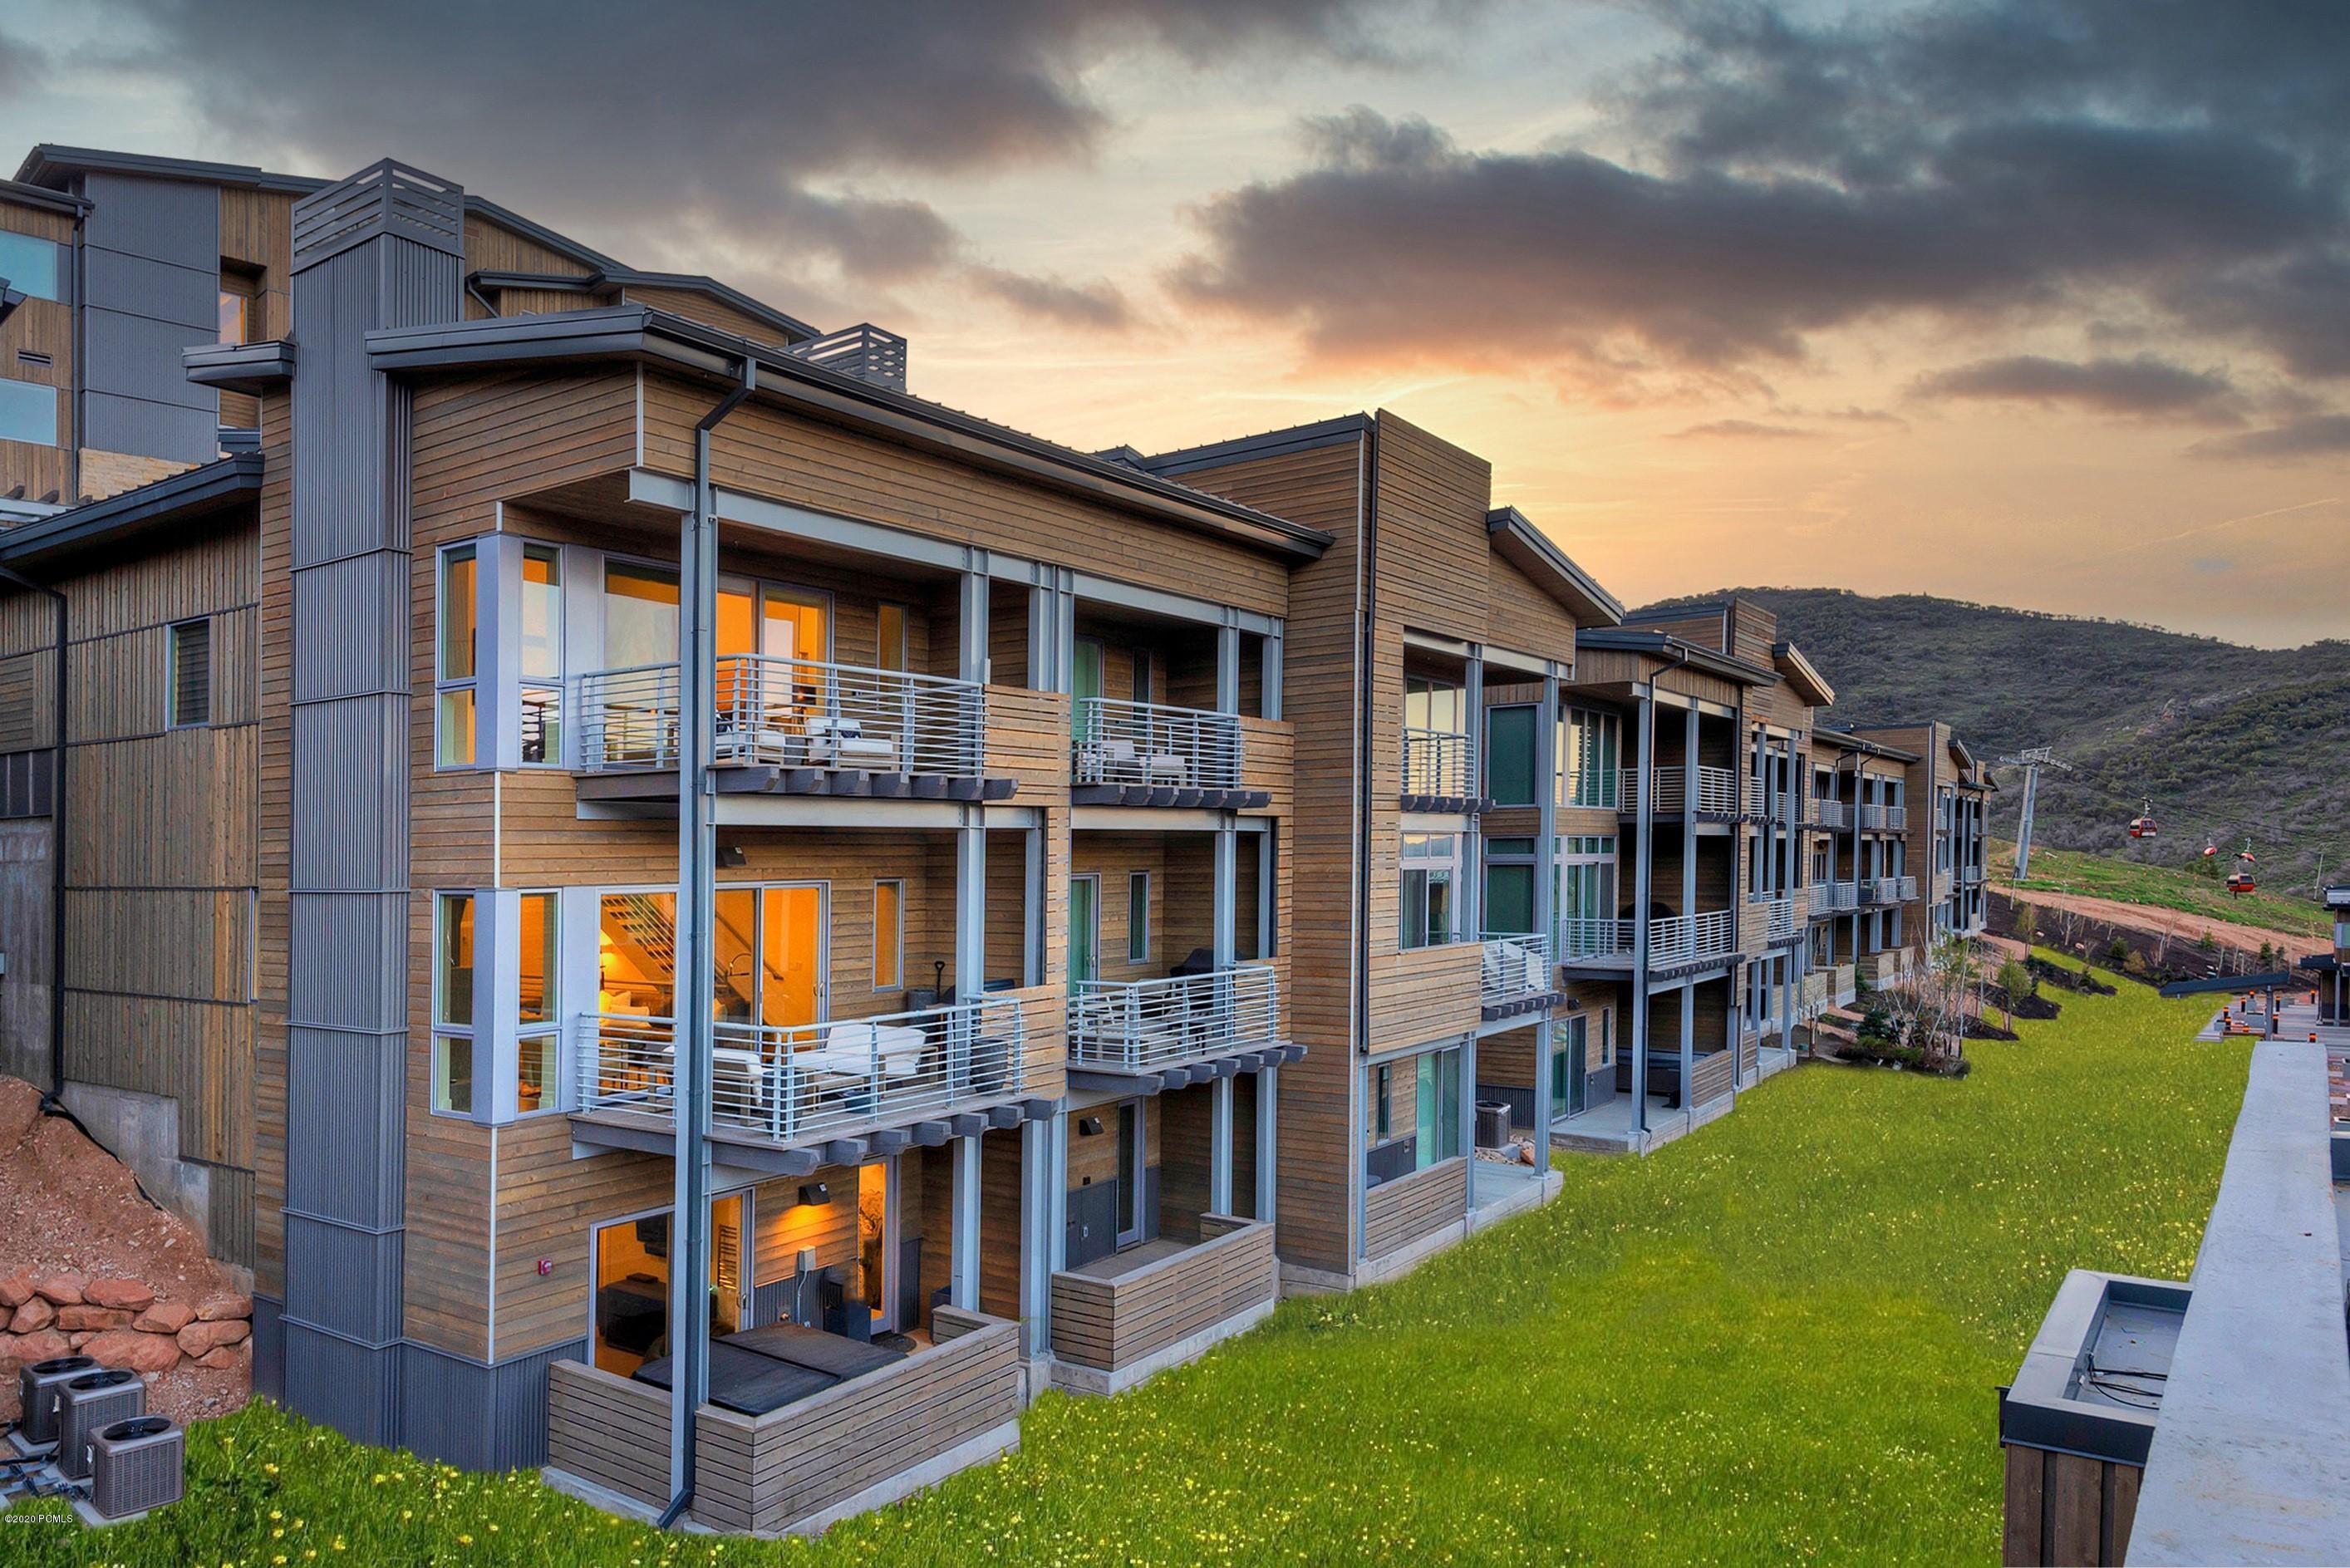 2752 High Mountain Road, Park City, Utah 84098, 3 Bedrooms Bedrooms, ,4 BathroomsBathrooms,Condominium,For Sale,High Mountain,20190109112430415765000000